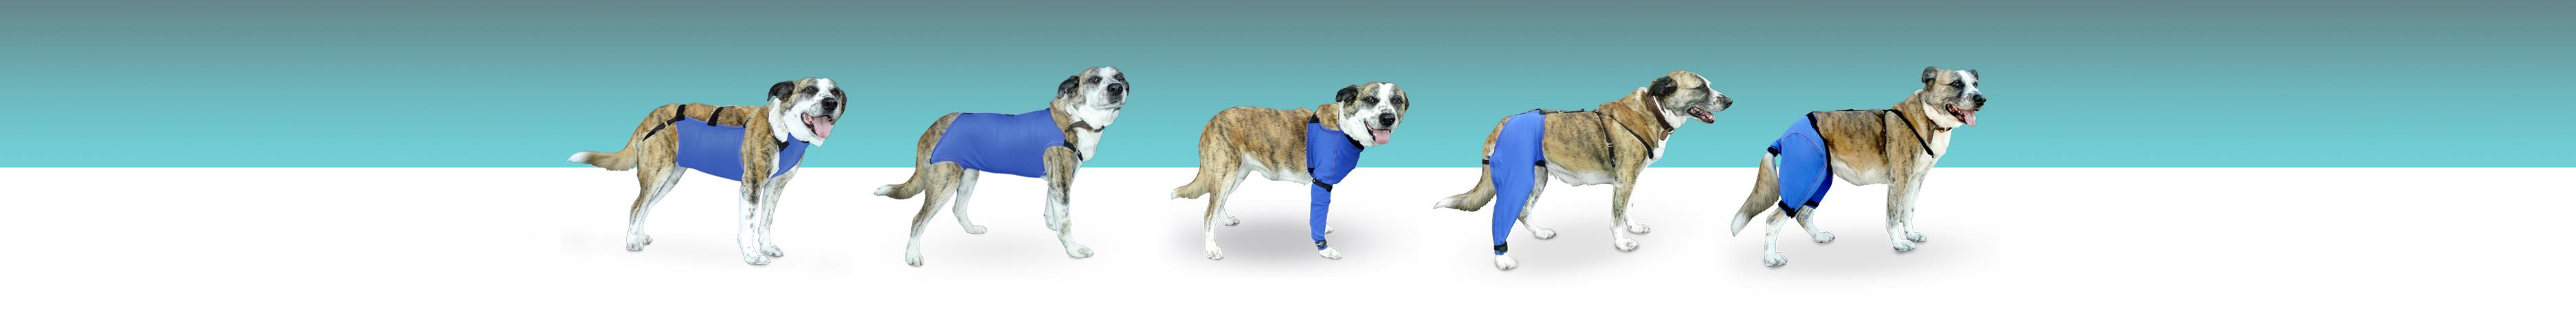 prendas protectoras veterinarias ppv antibacteriana mascotas